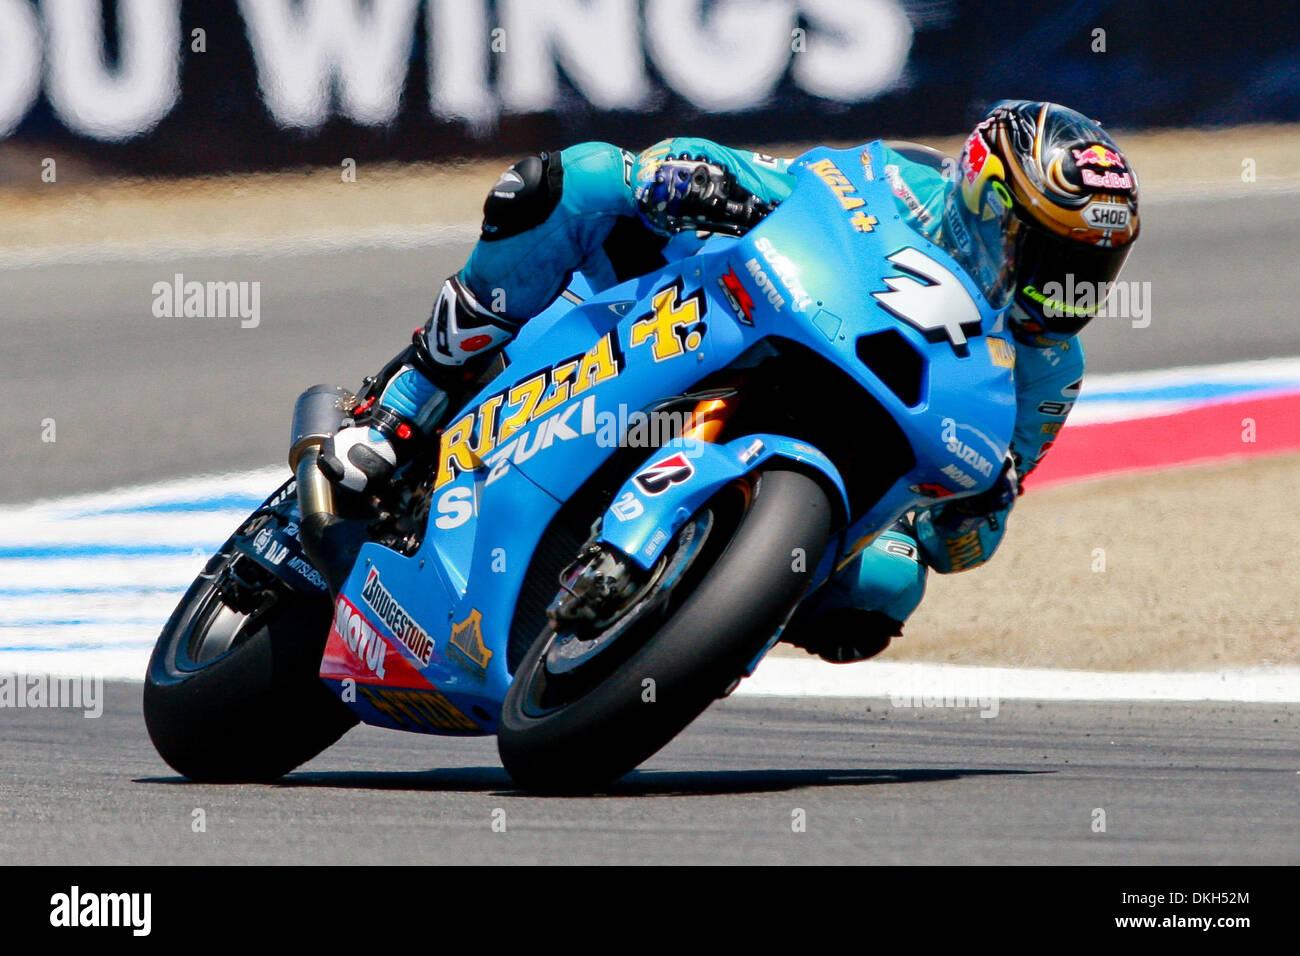 July 04, 2009 - Monterey, California, U.S - 04 July 2009: Chris Vermeulen, of Brisbane, Australia, rides the #7Stock Photo